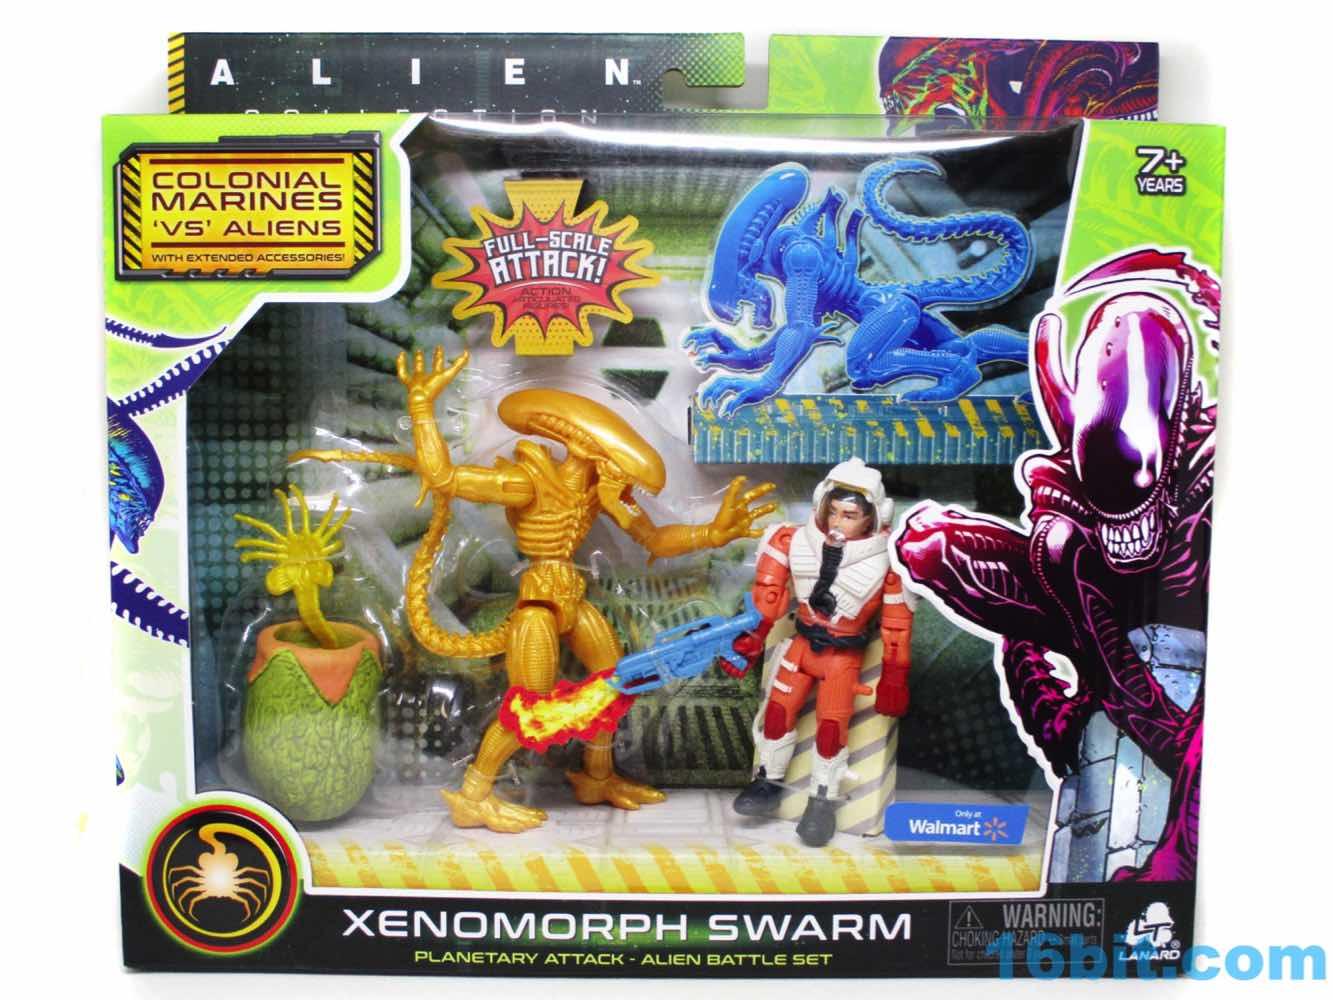 7 Best Xenomorph images   Xenomorph, Alien vs predator, Alien vs   1000x1333